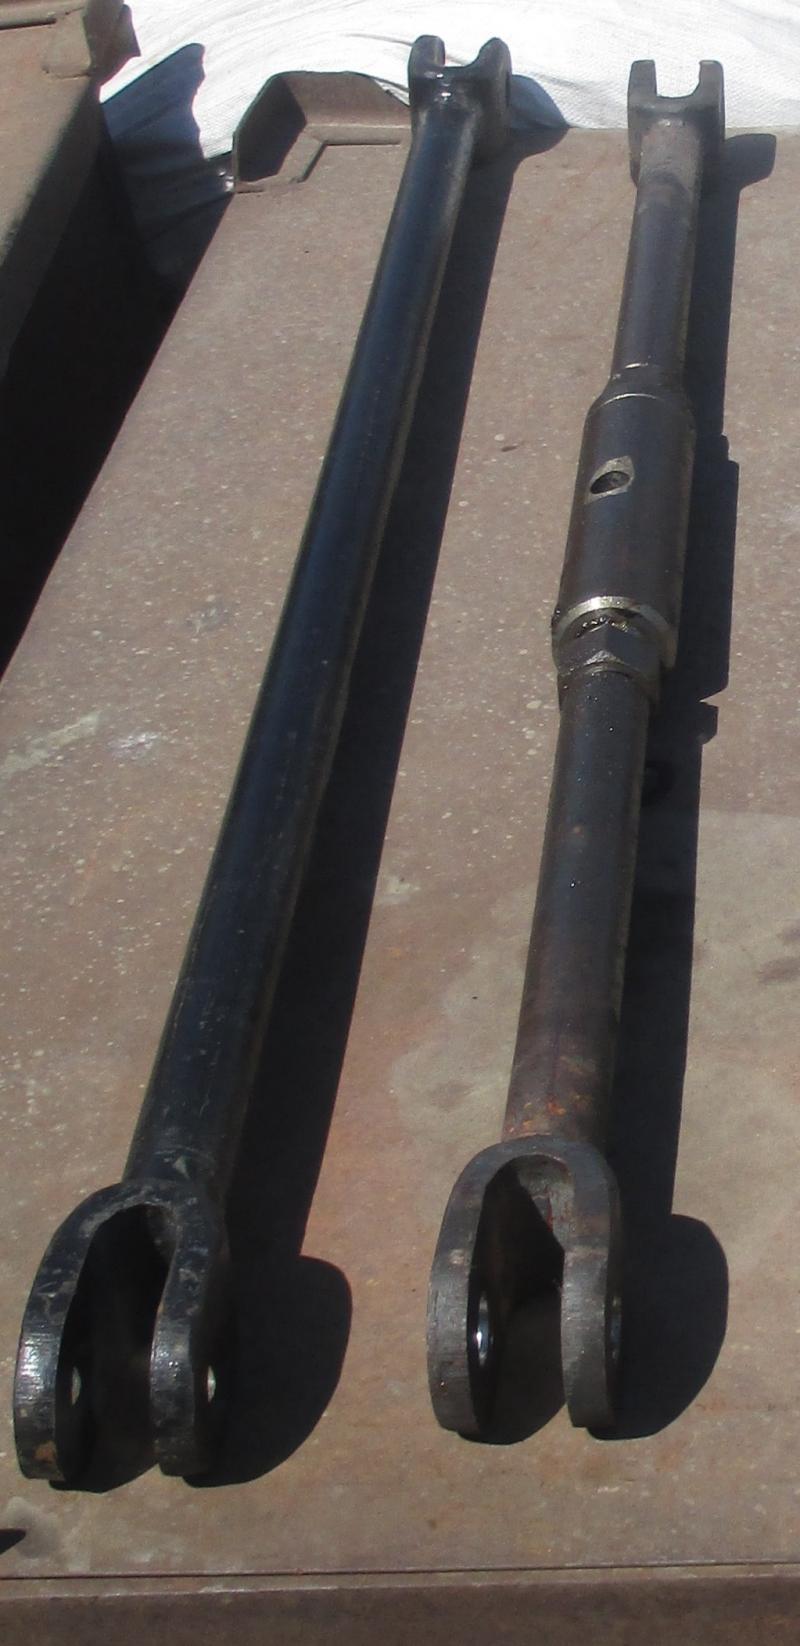 Тяга межостряковая первая СП 54 на складе новая и бу